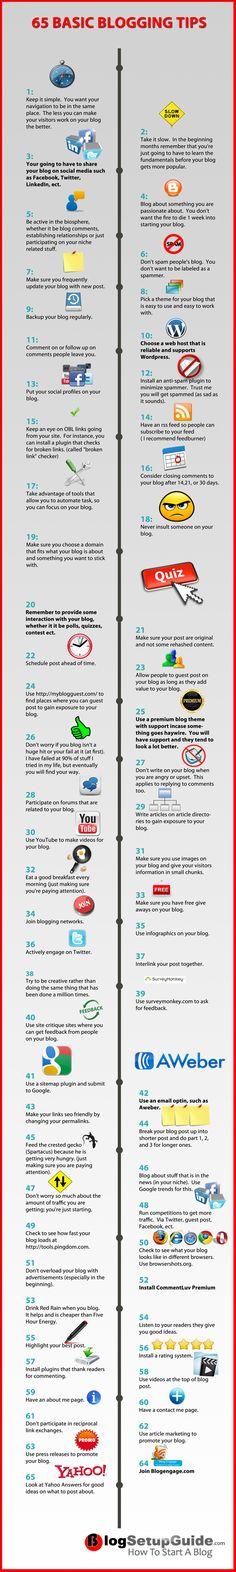 65 Basic Blogging Tips